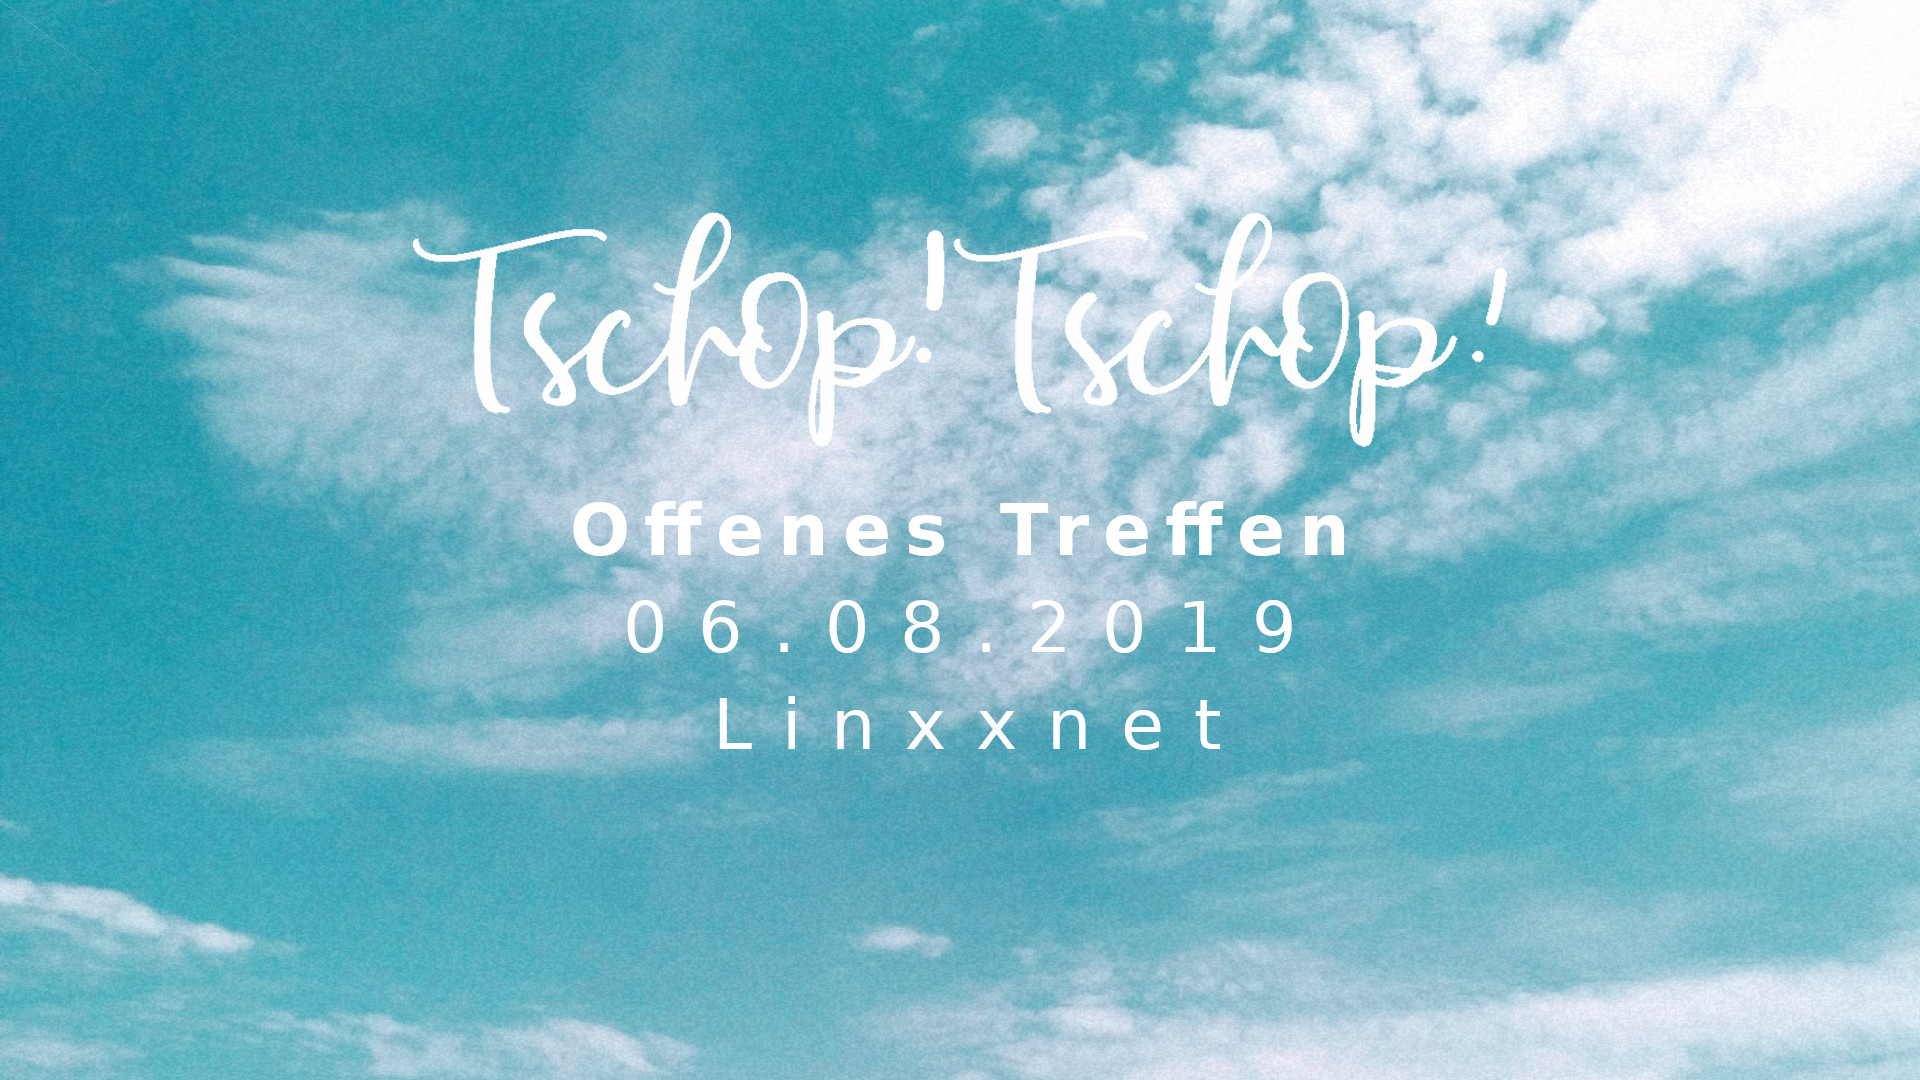 "Symbolbild mit Text: ""Tschop! Tschop! offenes Treffen 06.08.19 Linxxnet"""